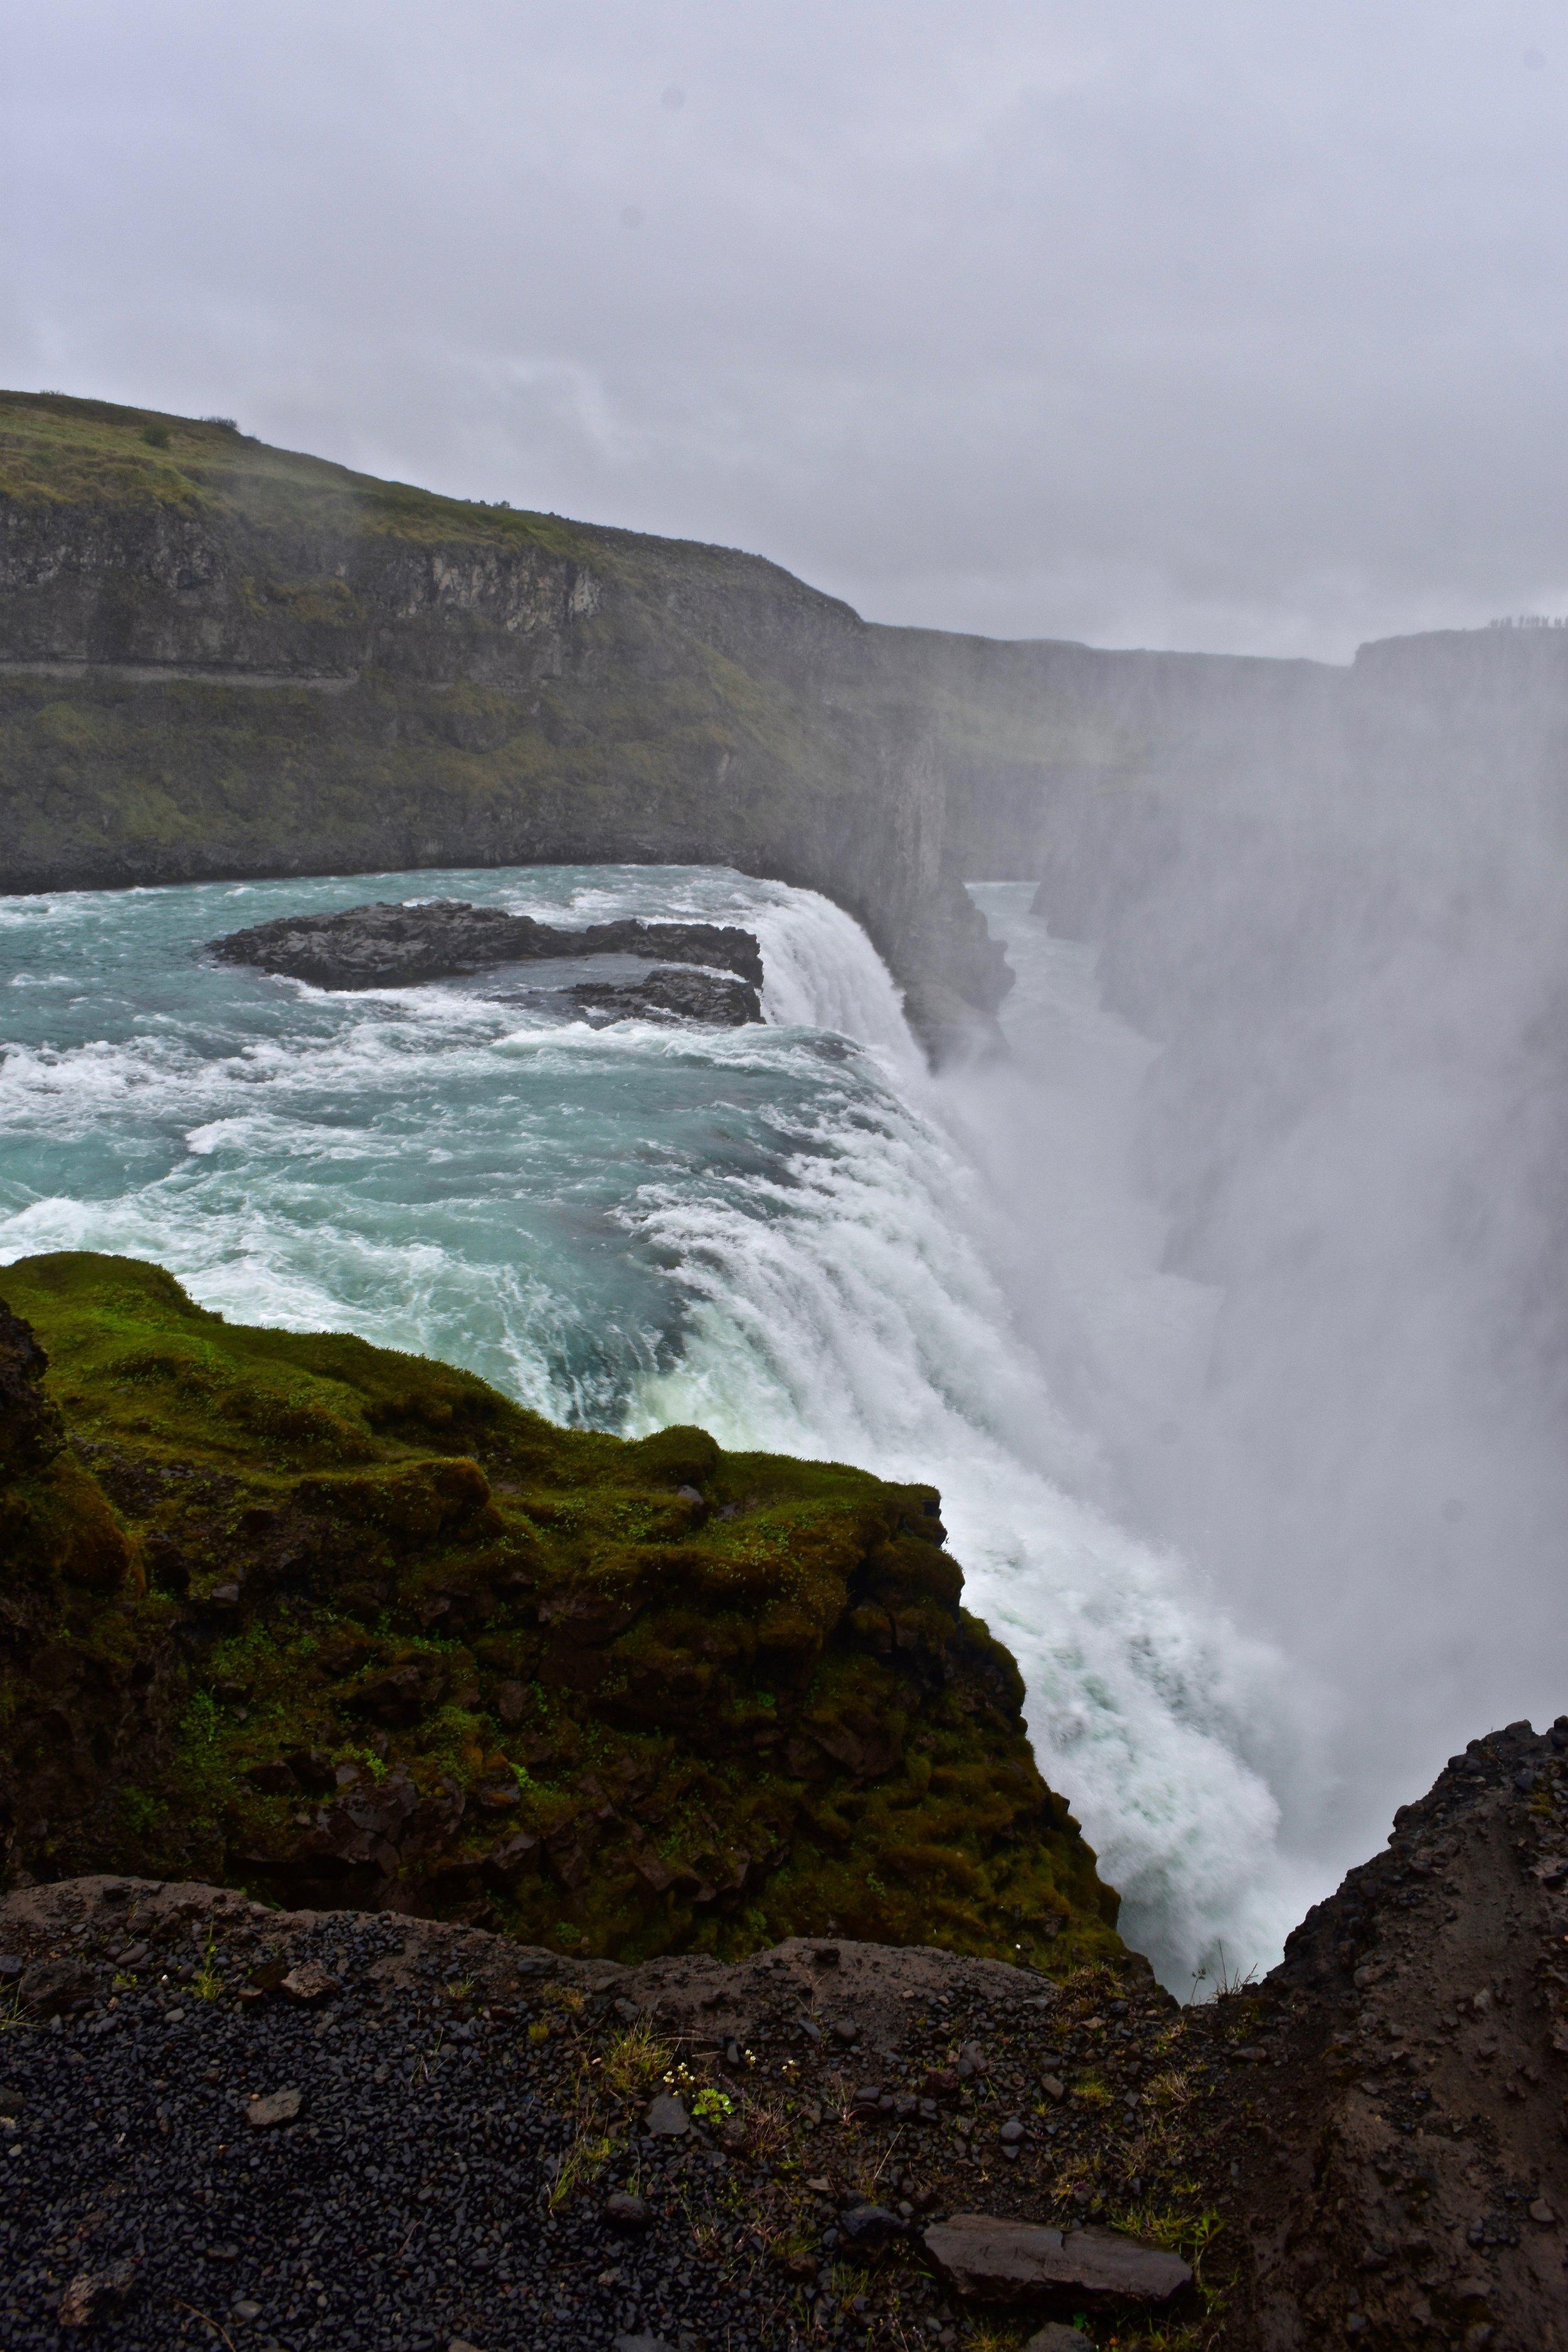 Gullfoss Waterfall on Iceland's Golden Circle near Reykjavik